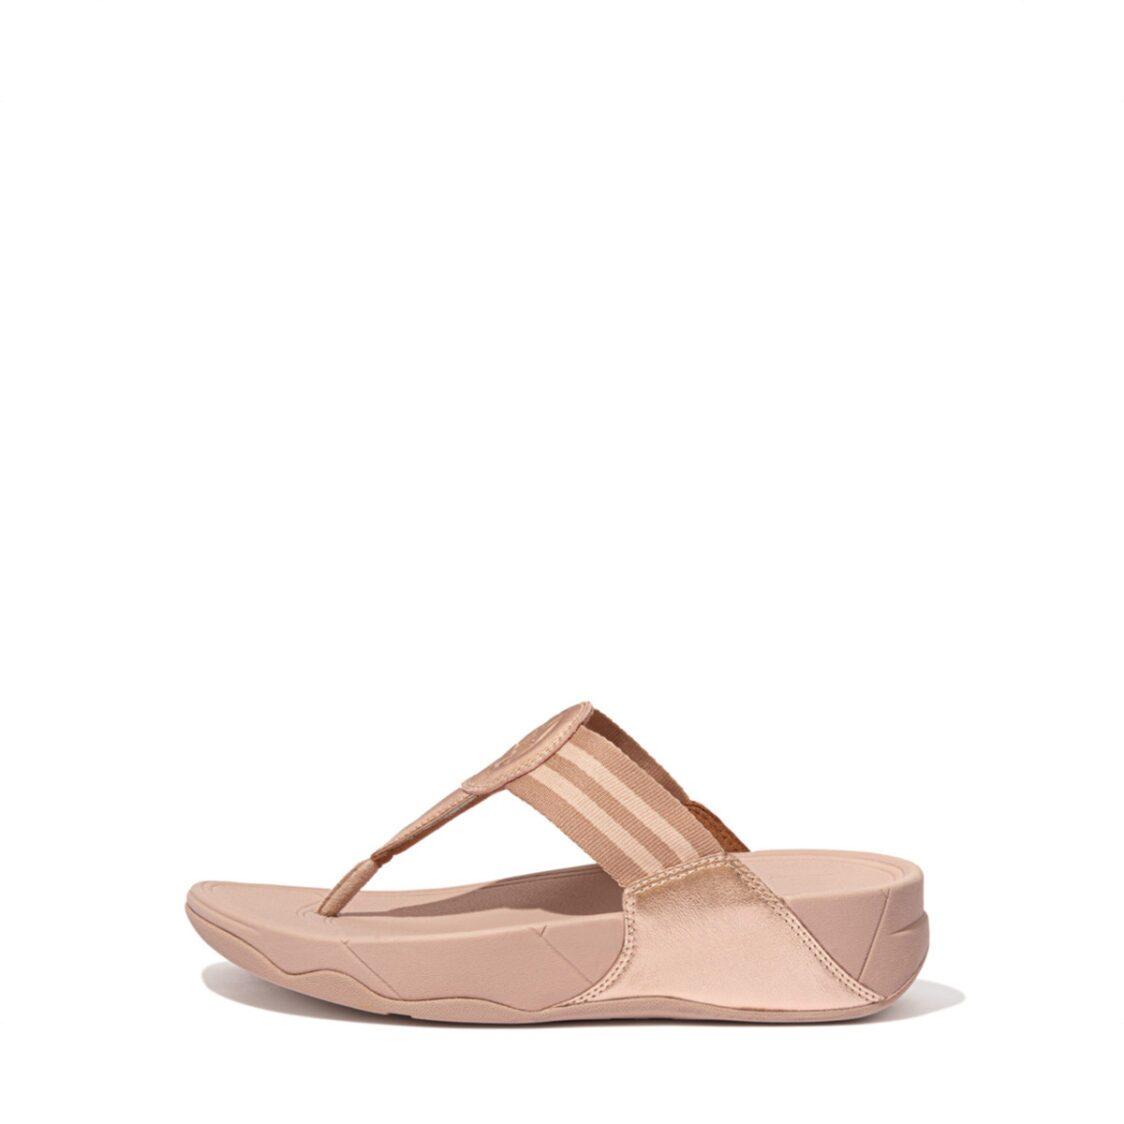 Fitflop Walkstar Toe-Post Sandals Rose Gold Dx4-323